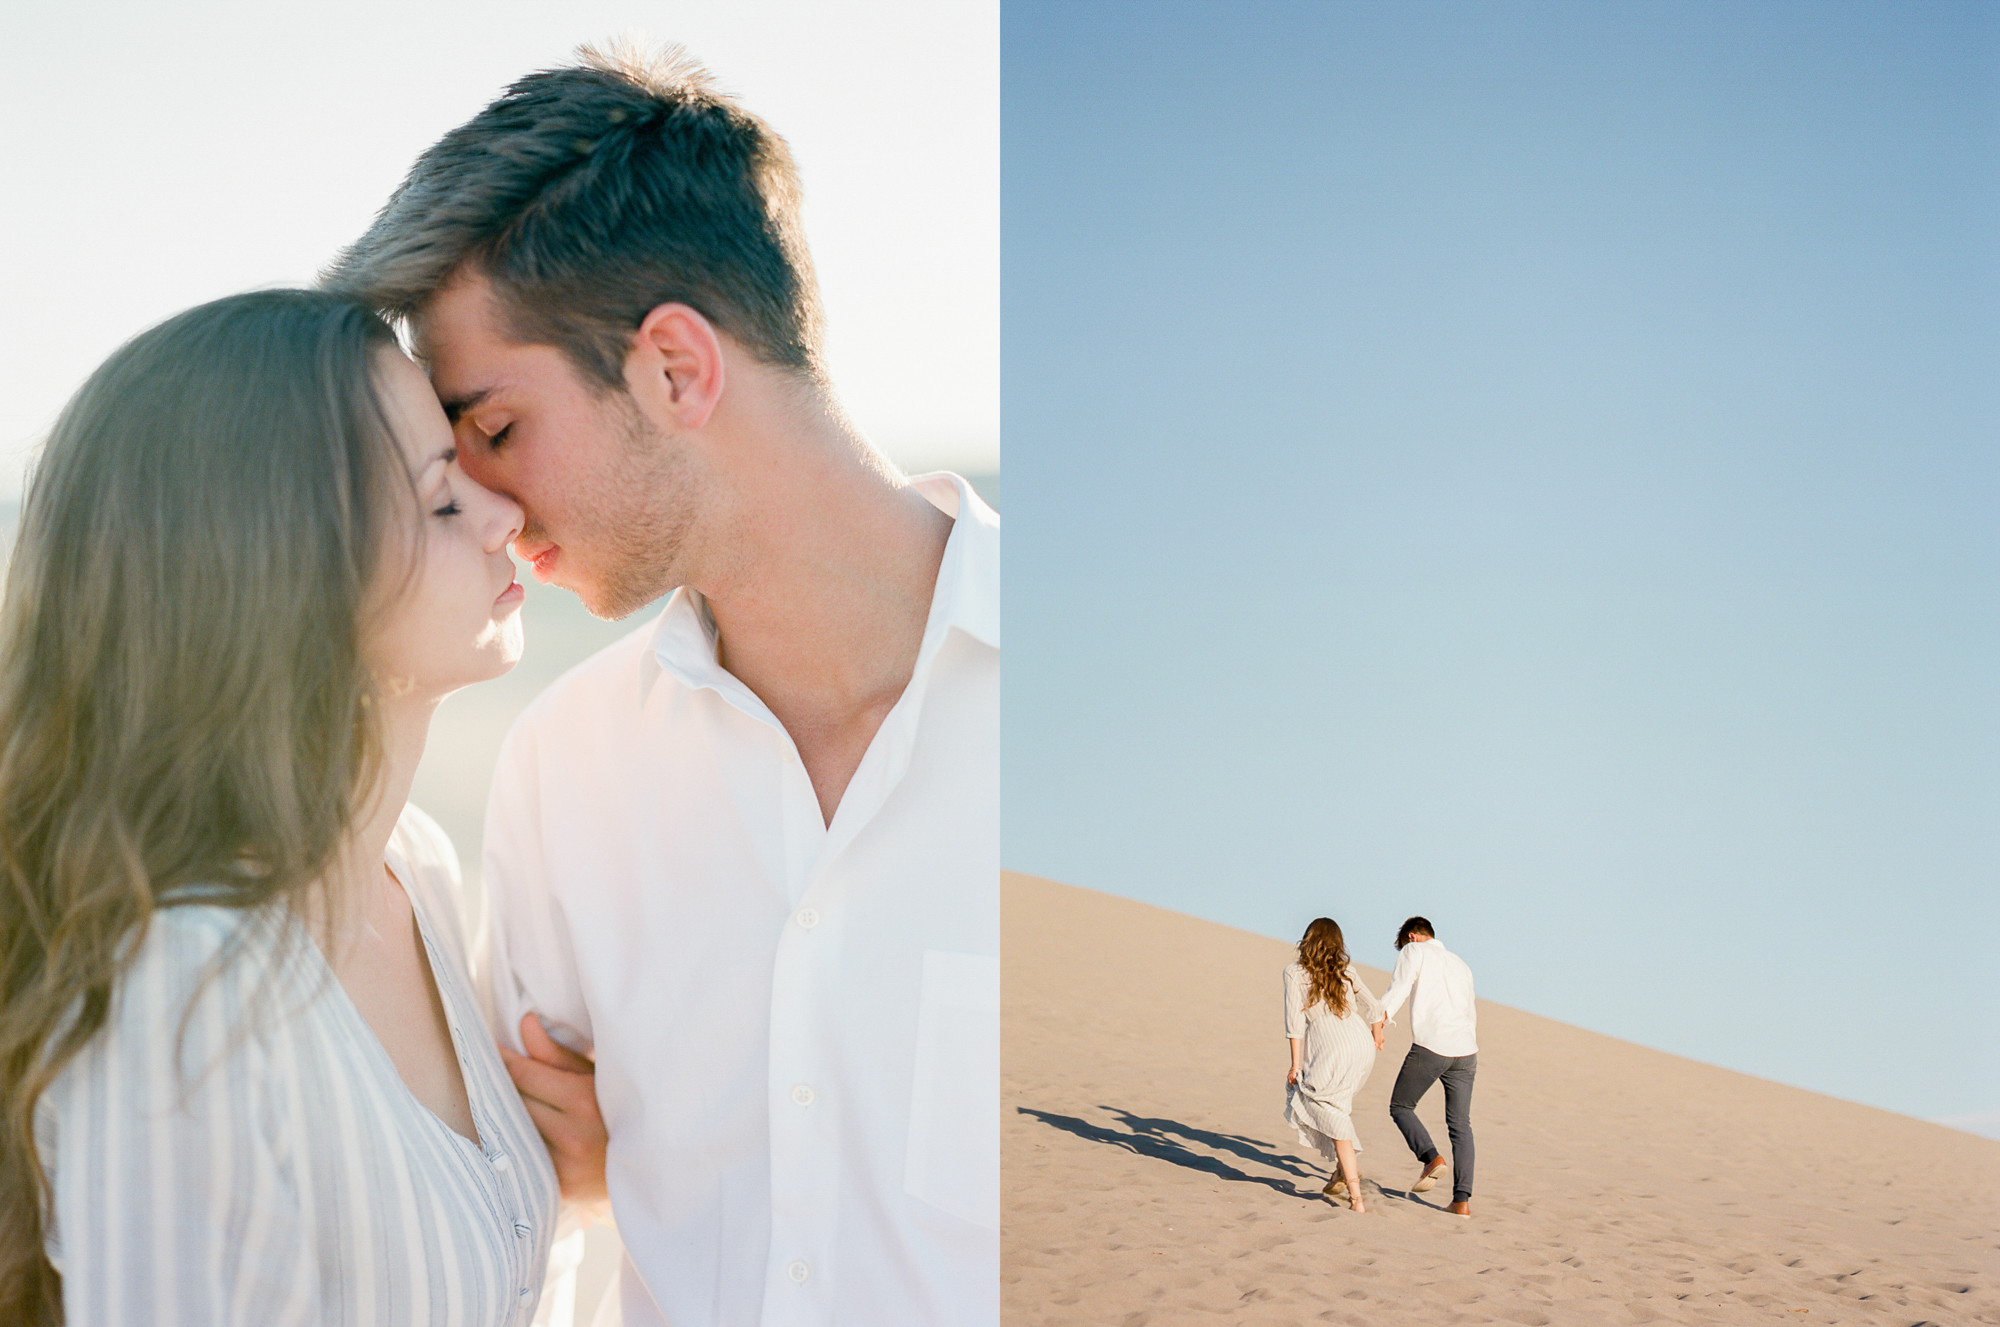 charlotte-charleston-wedding-family-film-destination-photographer-bruneau-sand-dunes-boise-idaho-3.jpg